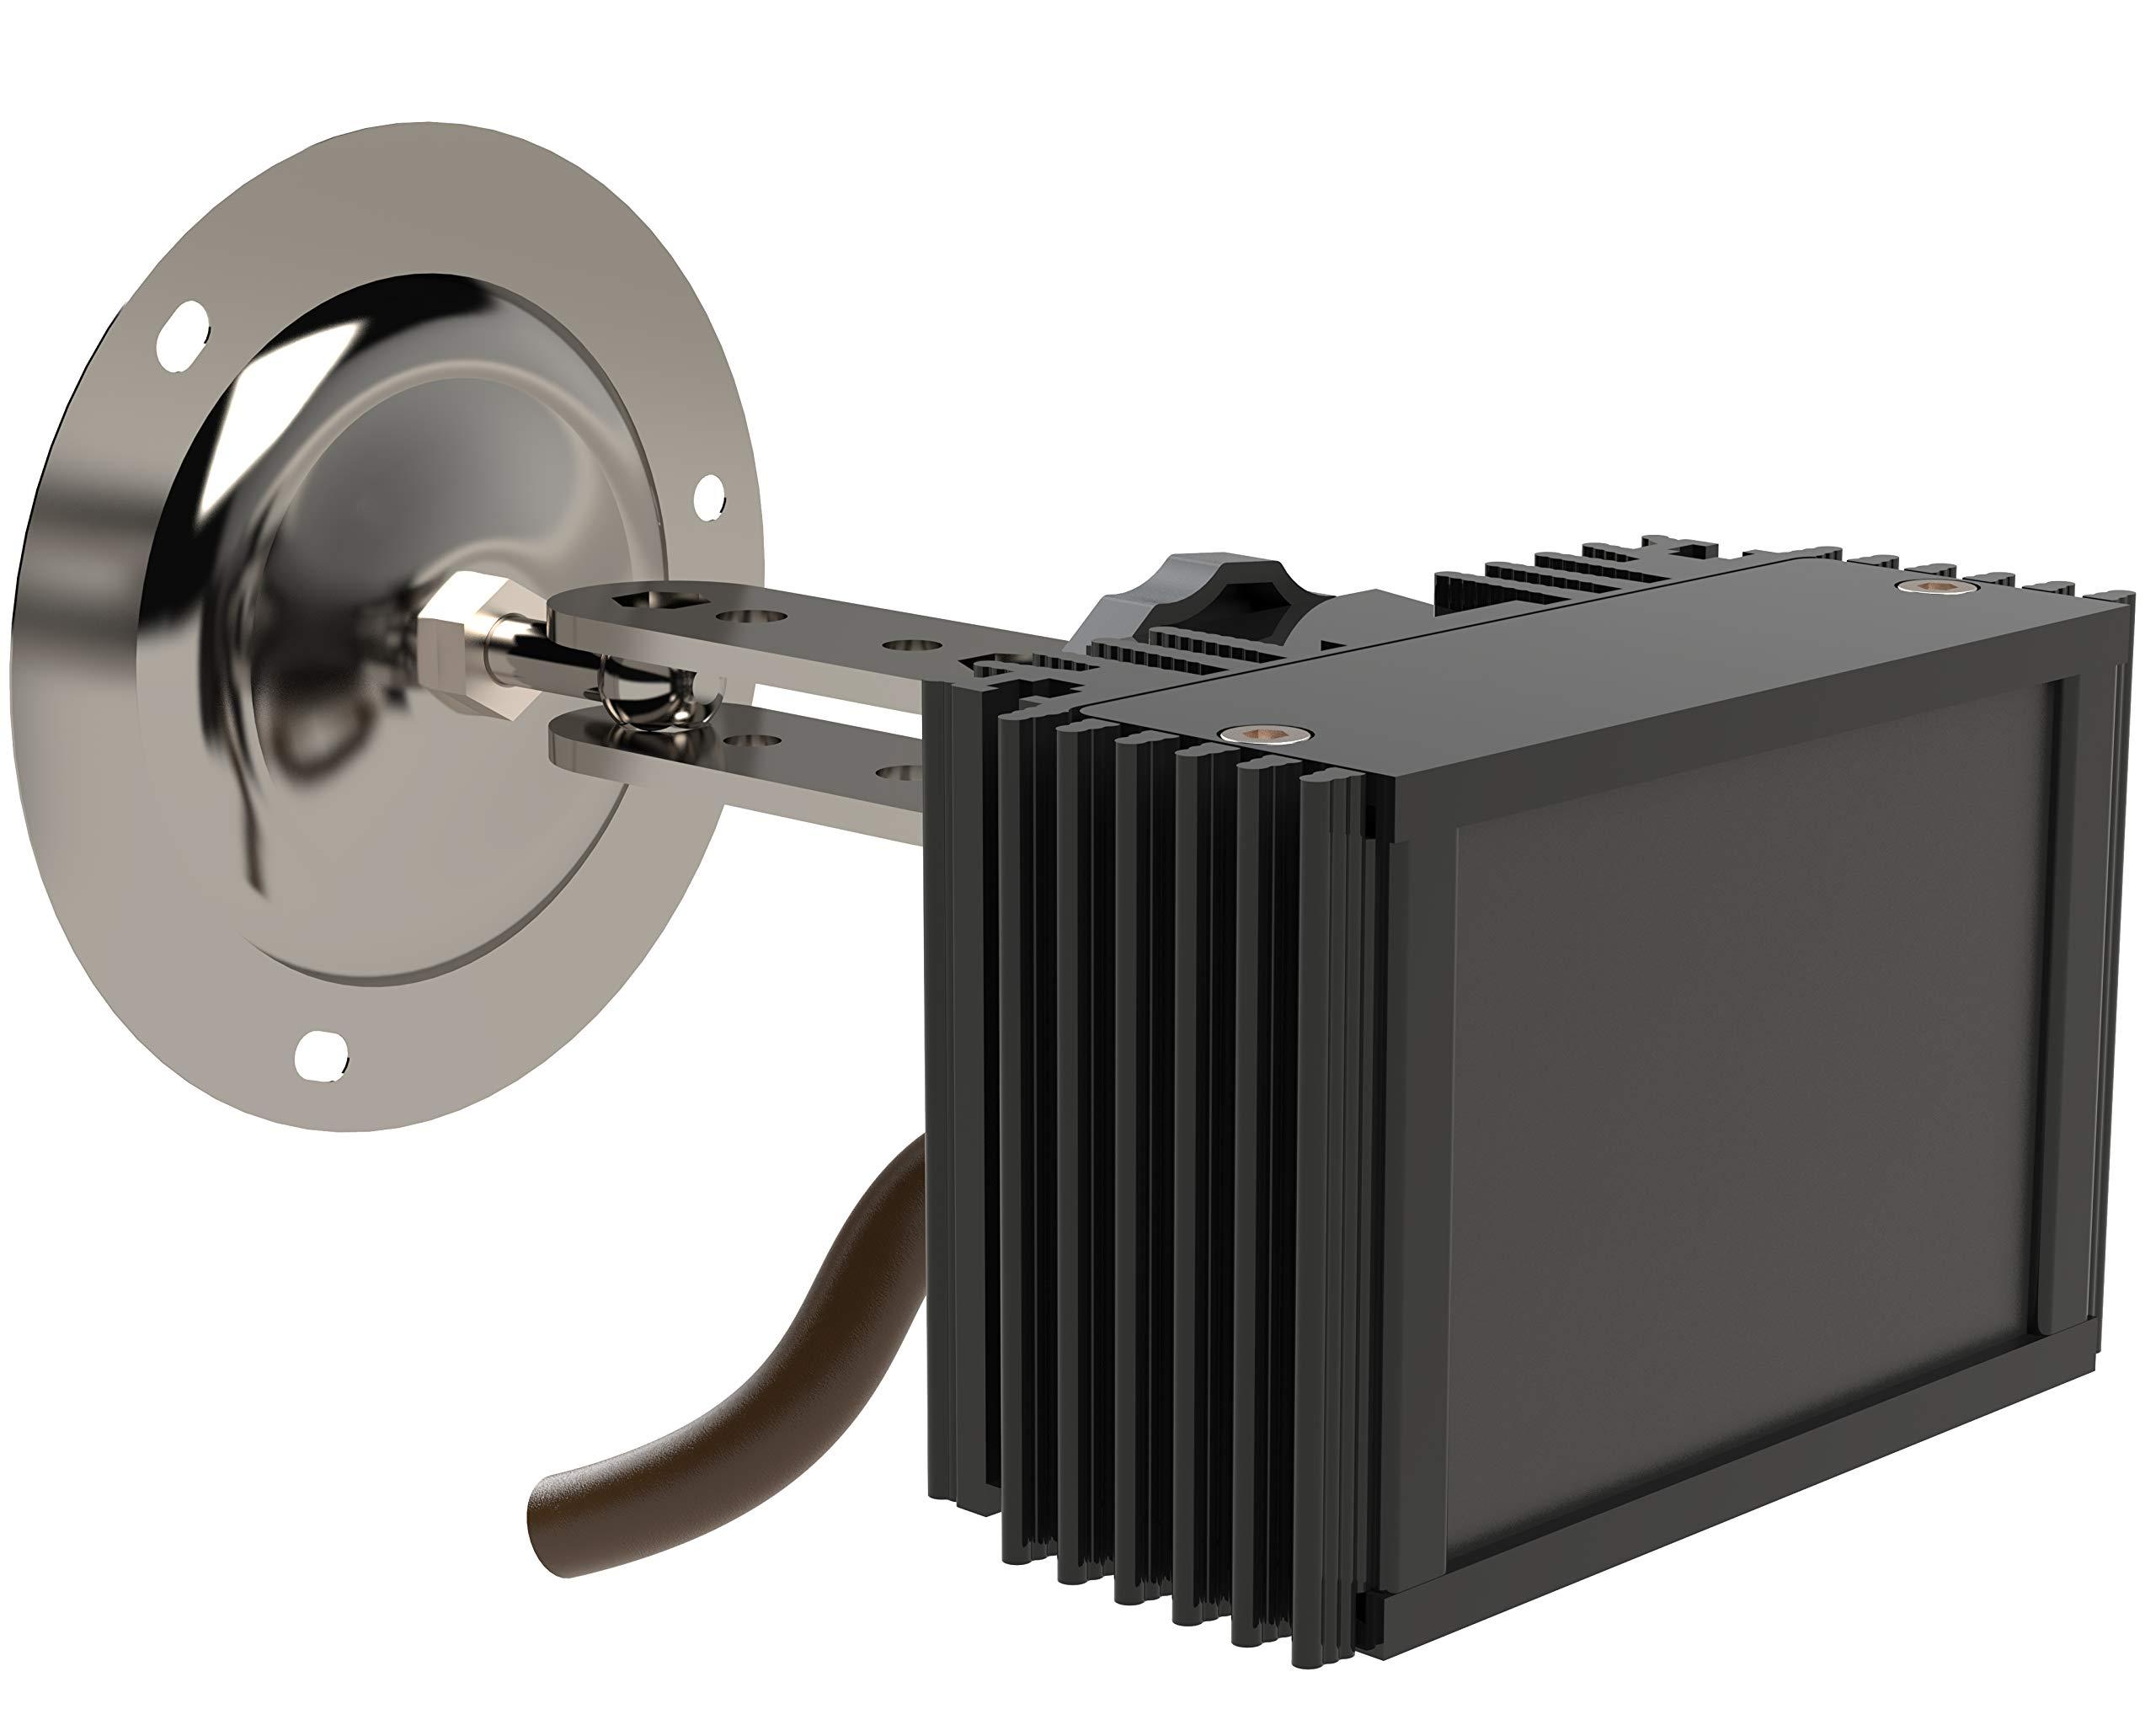 Infrared Illuminator Microlight IR Helios S-90/30 90deg Wide Angle up to 70ft Night Vision Outdoor IP67